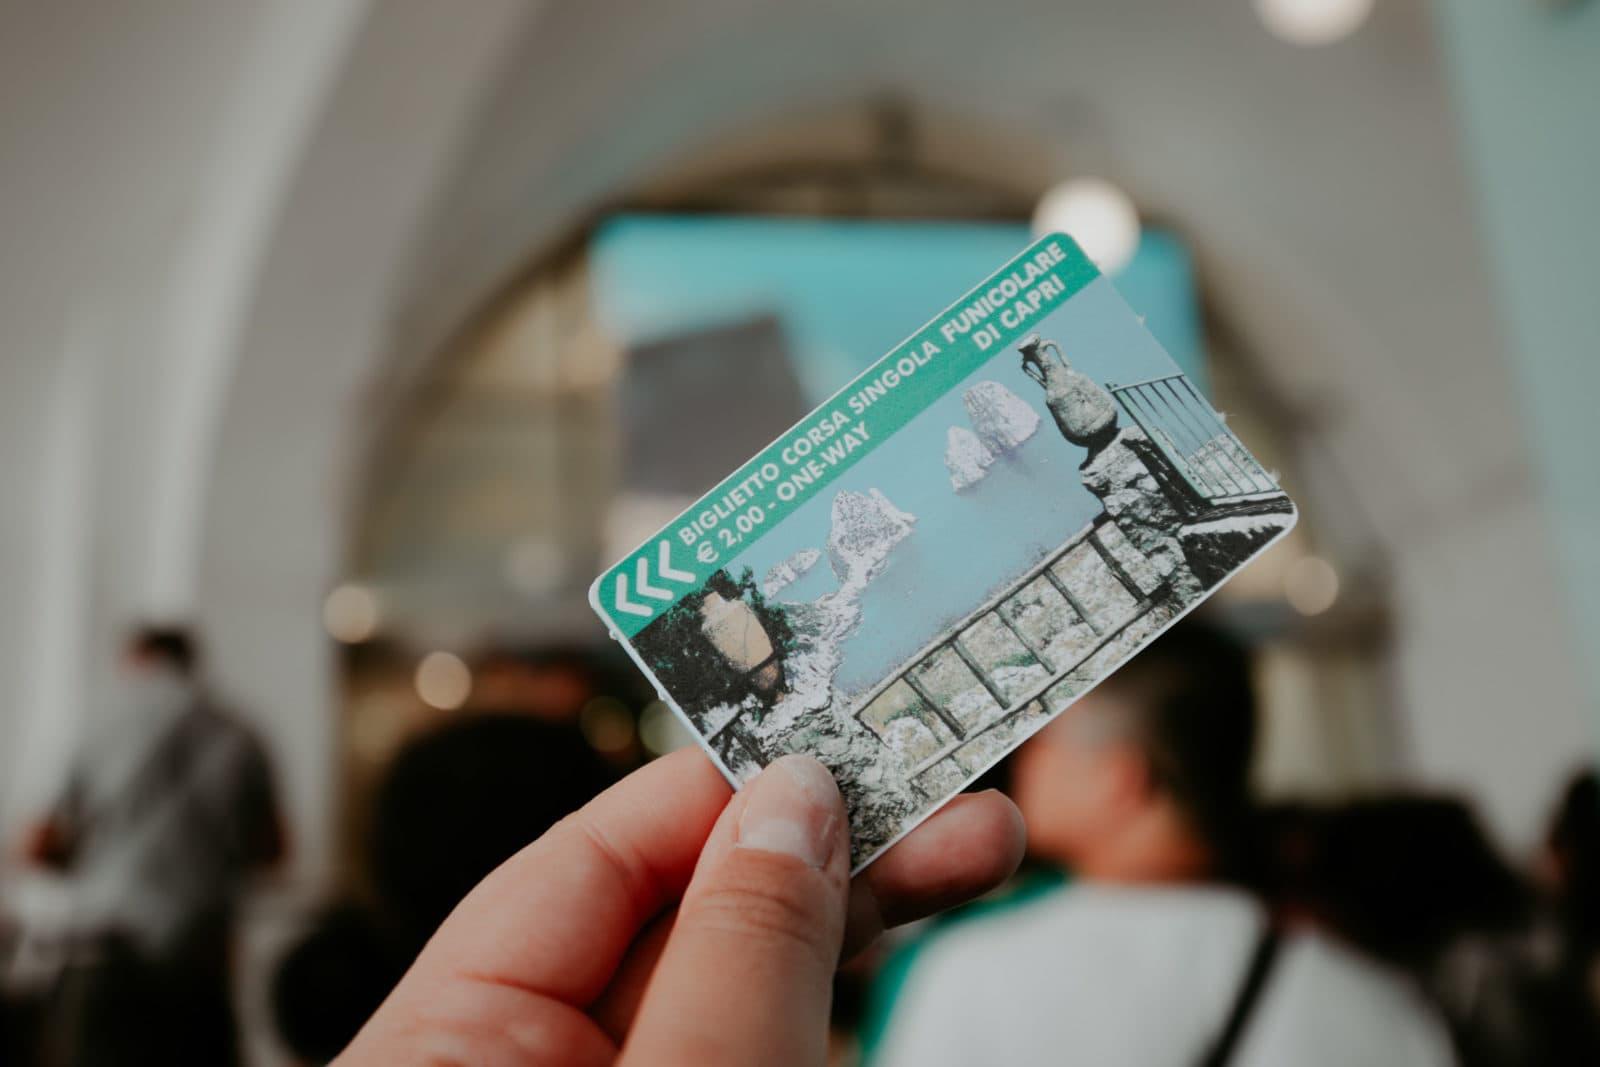 Capri Ticket Fahrkarte für Seilbahn